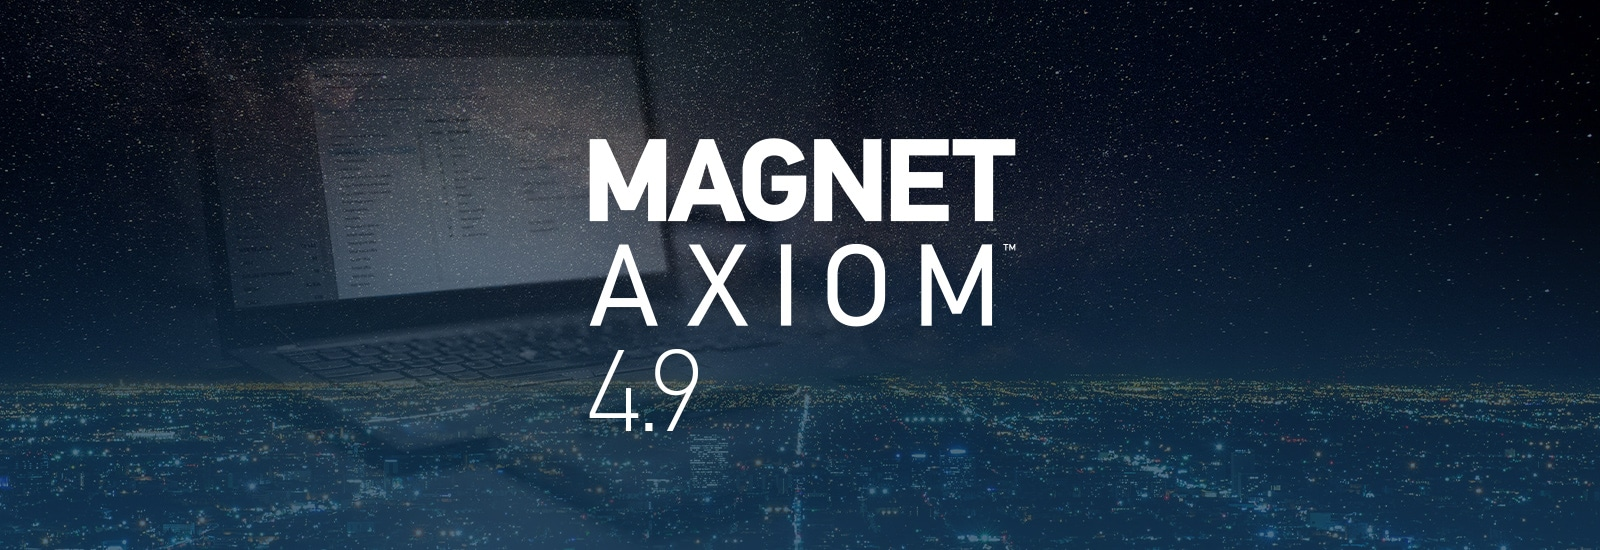 Magnet AXIOM 4.9